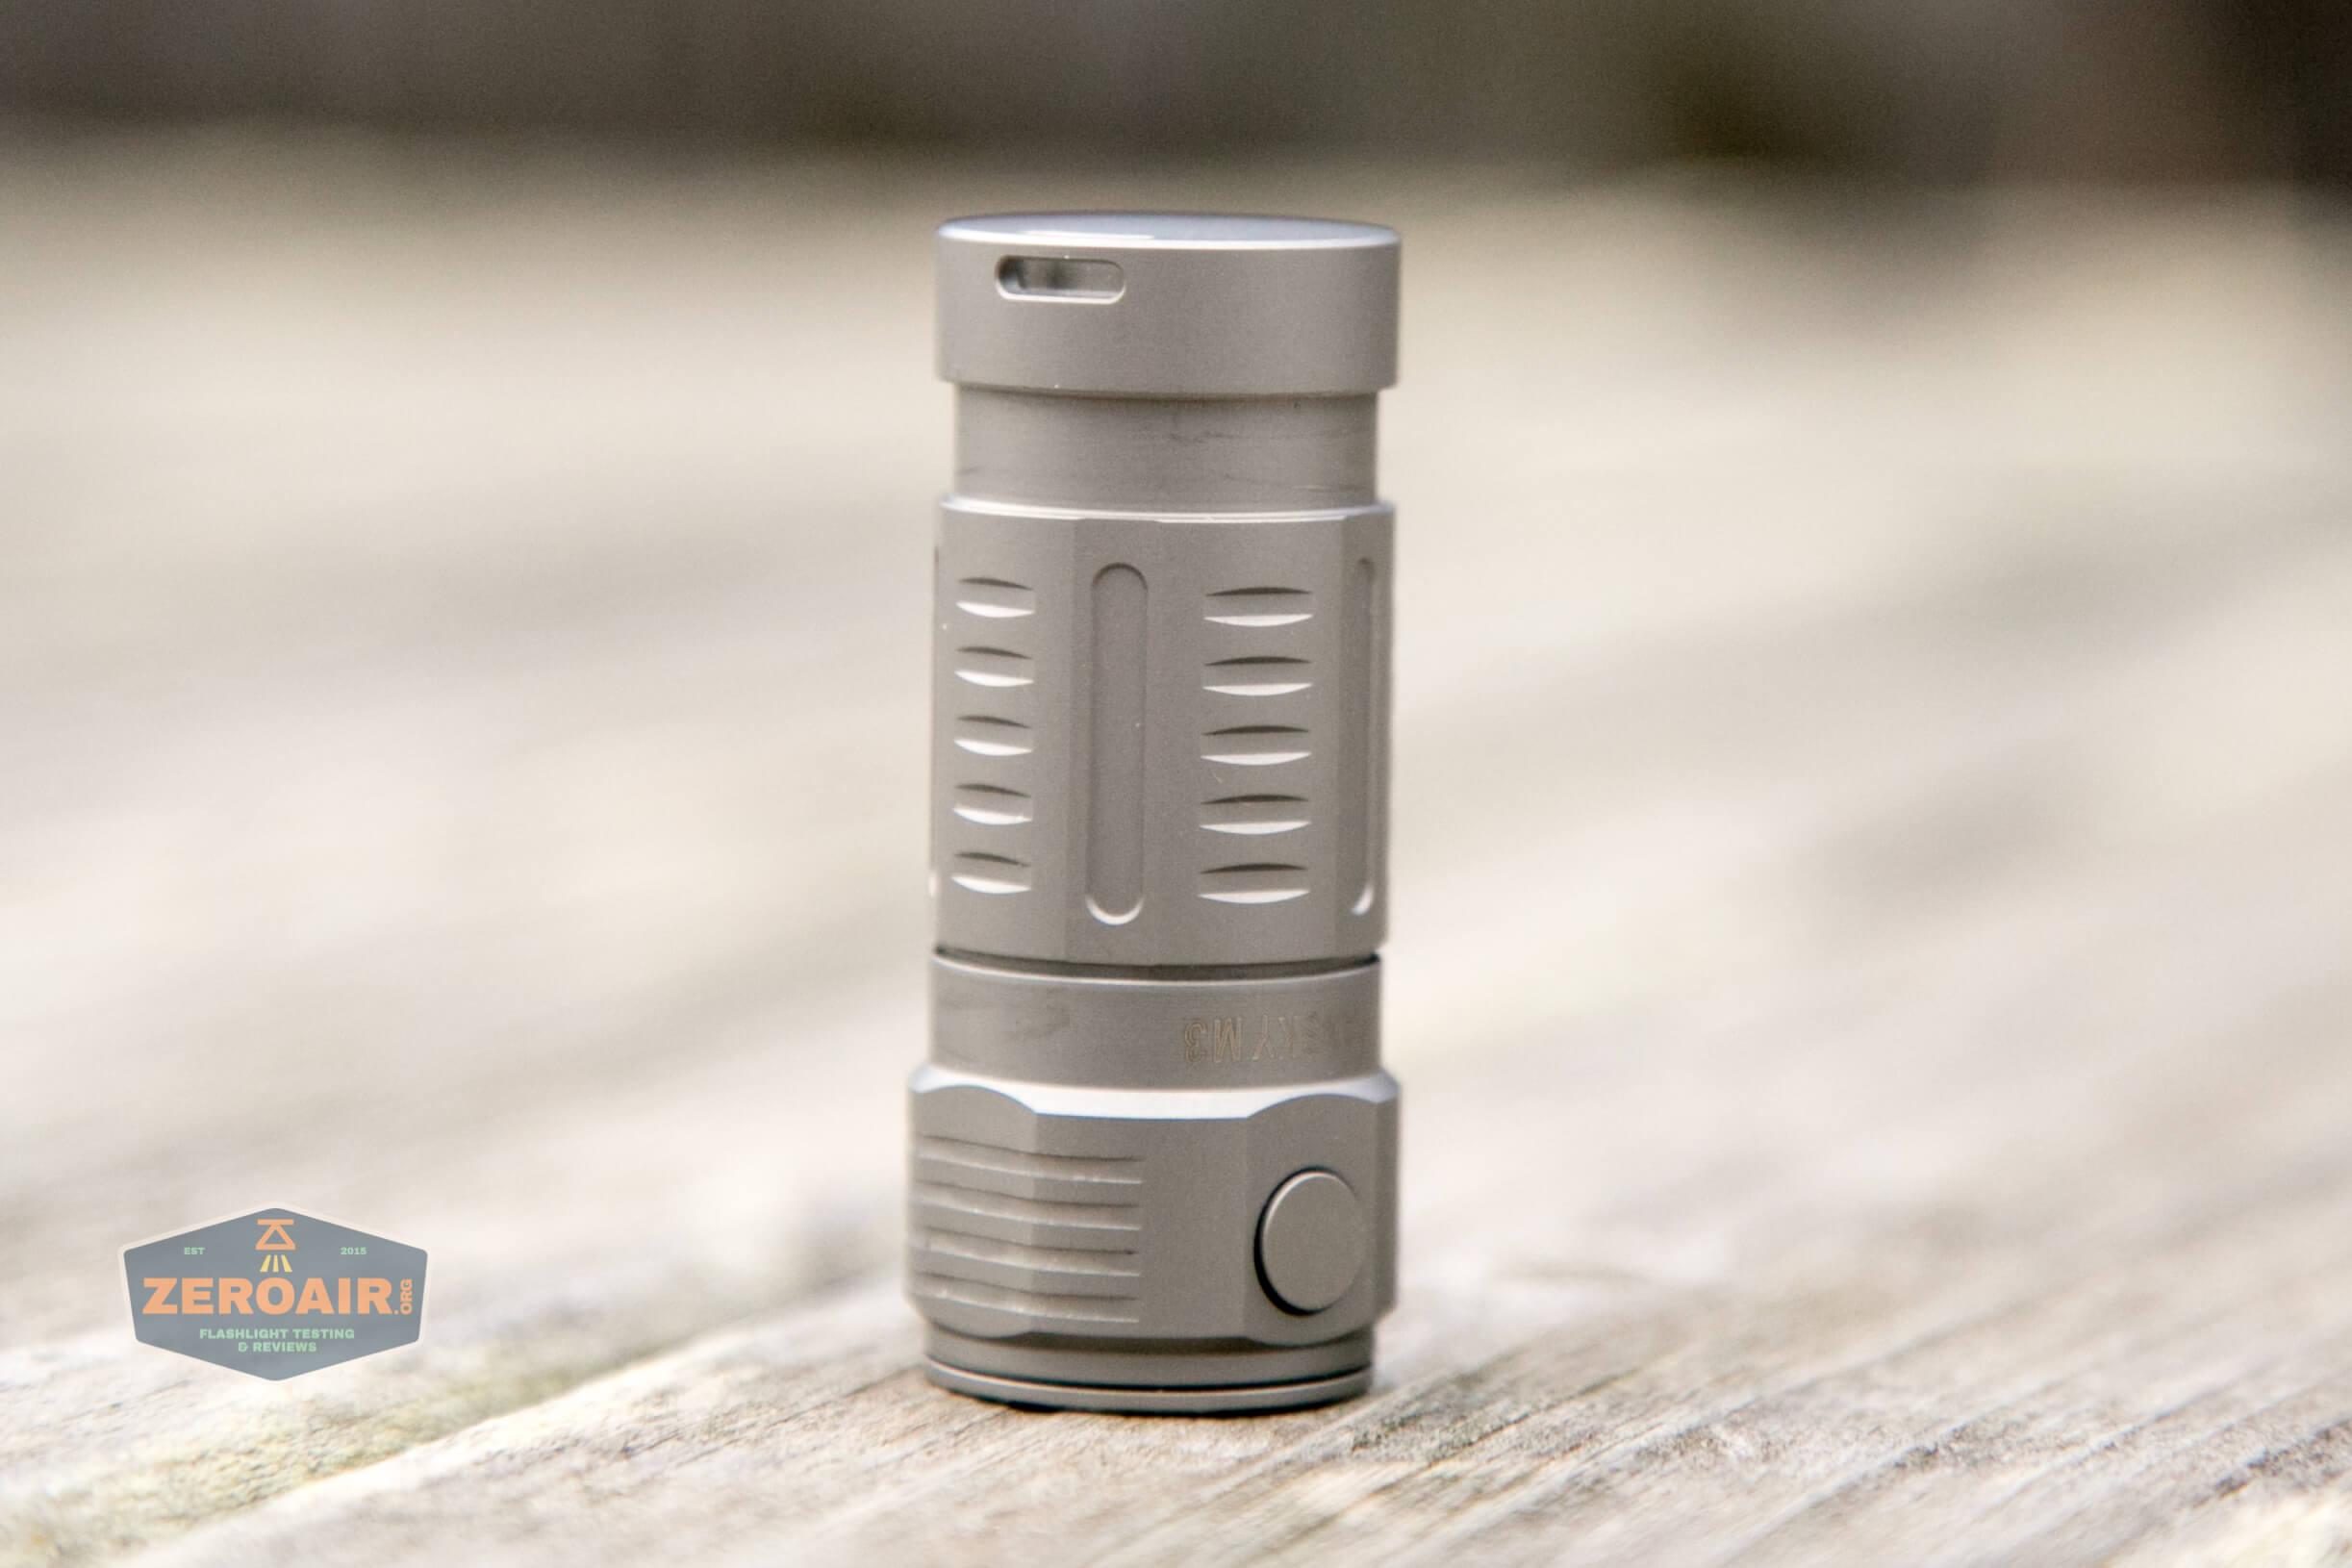 freasygears cyansky m3 titanium pocket flashlight clip scratches